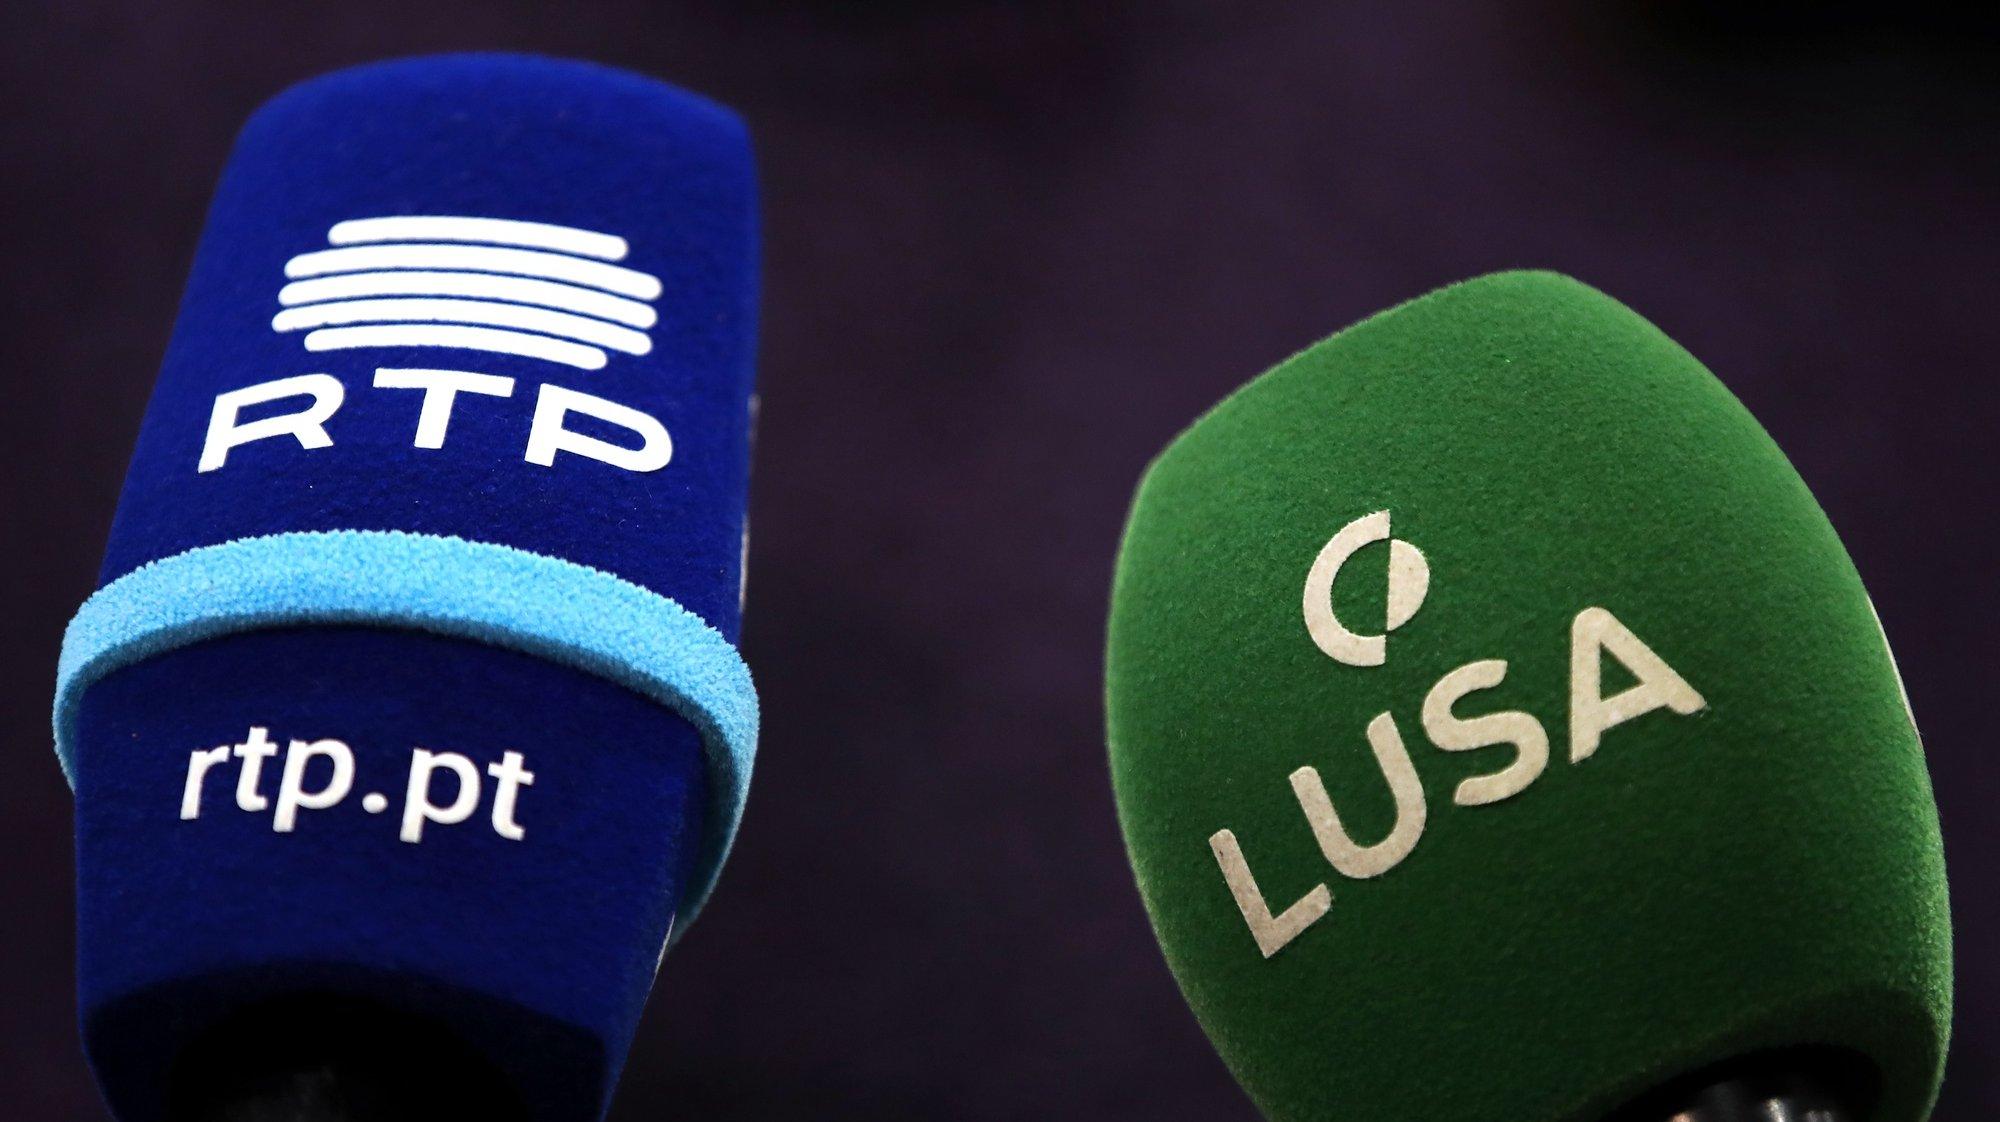 Microfones da RTP e Lusa .     MANUEL DE ALMEIDA/LUSA